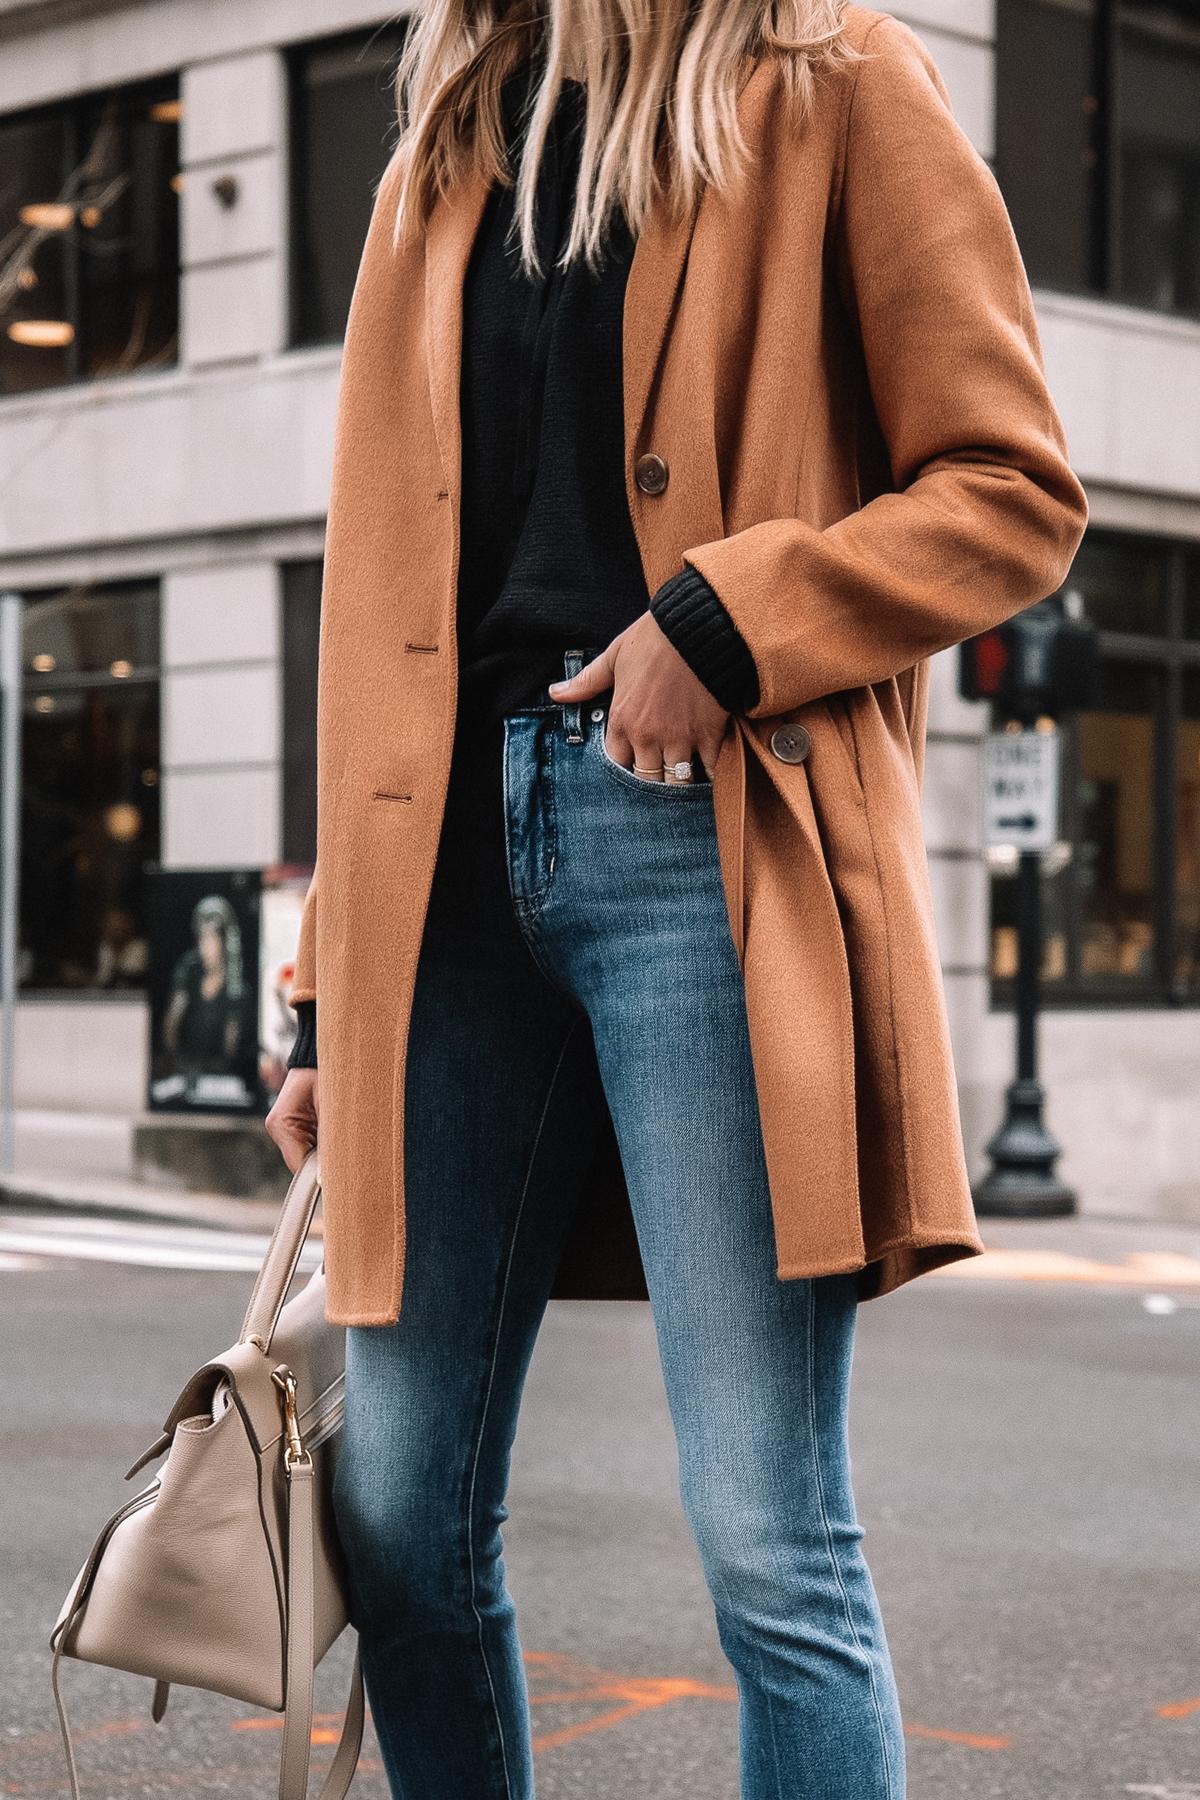 Fashion Jackson Wearing Banana Republic Camel Coat Black Sweater Denim Jeans